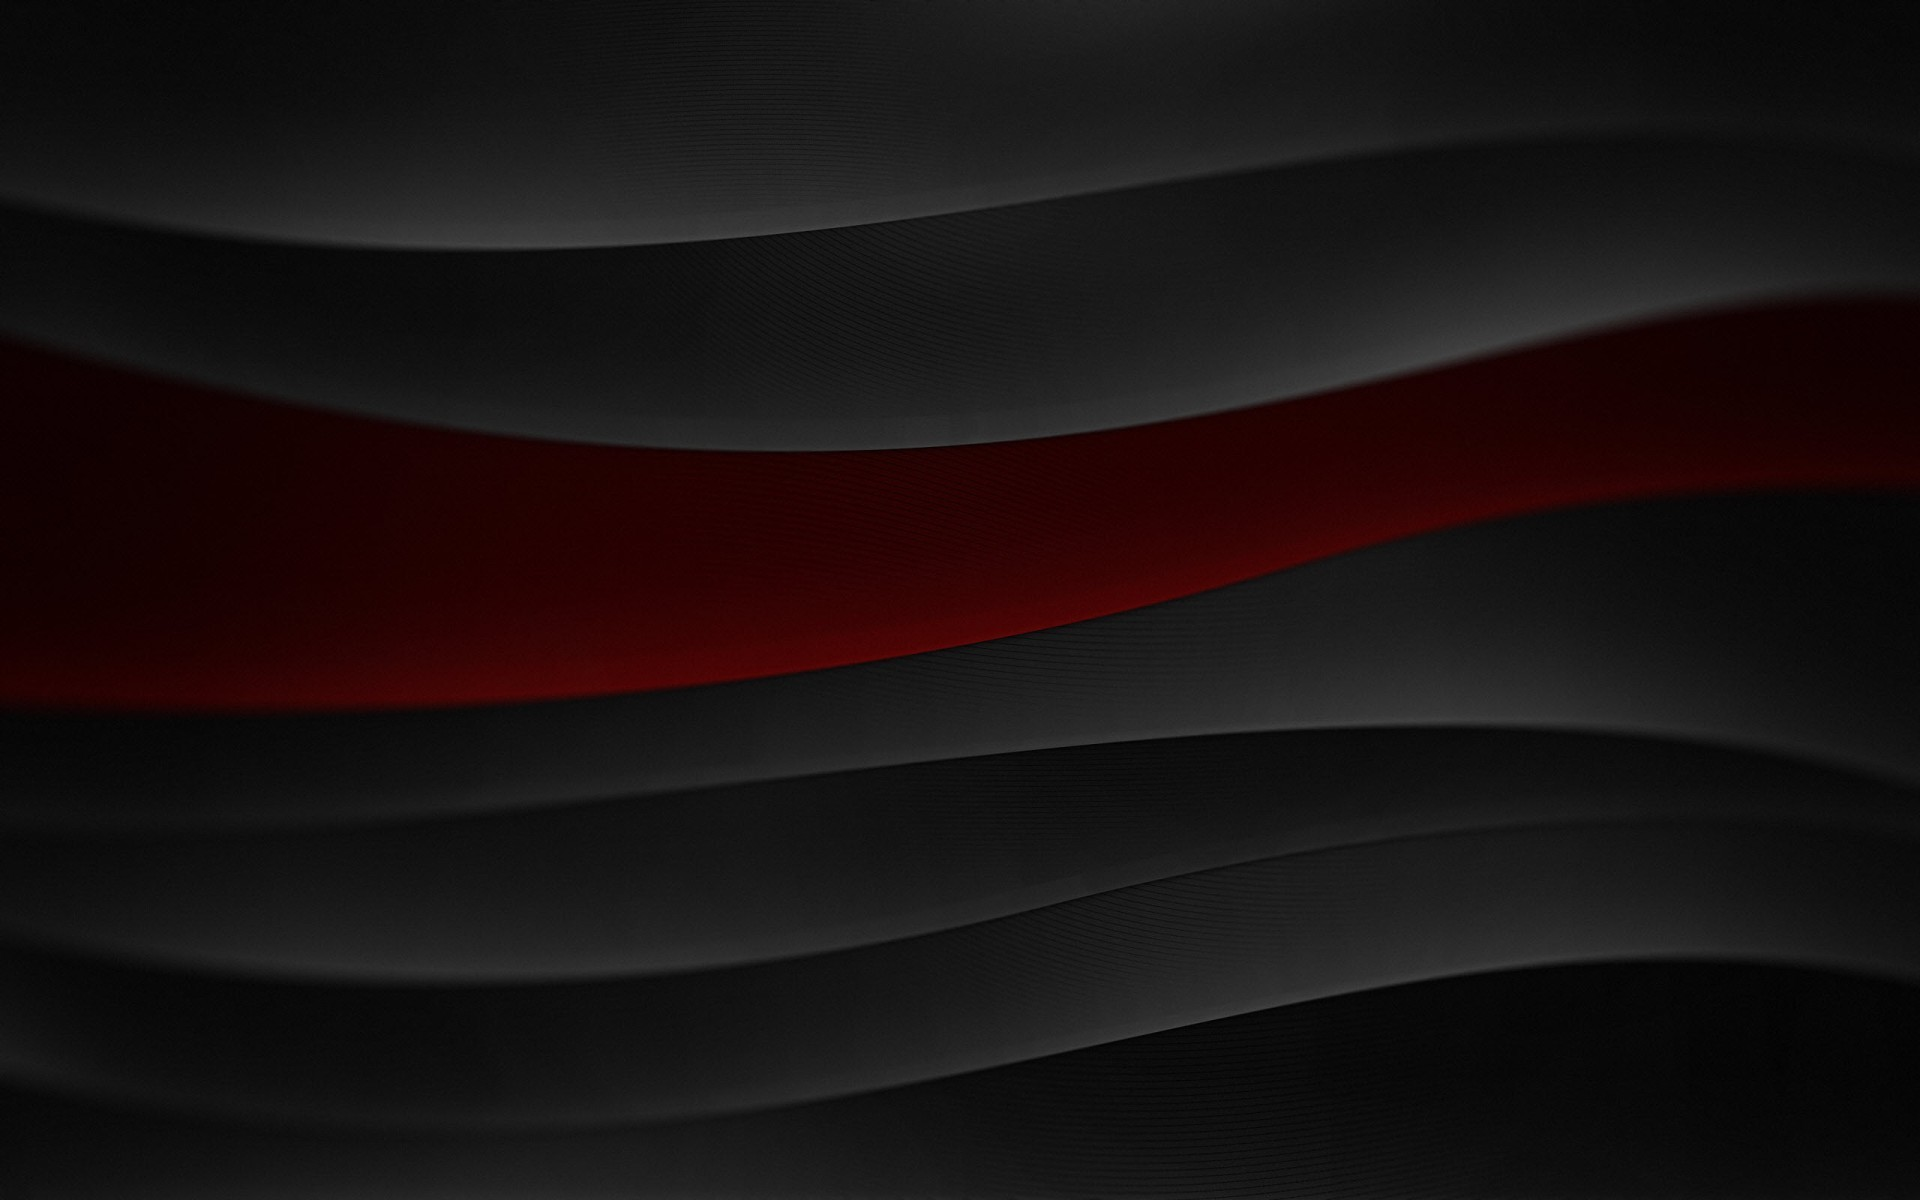 red wallpaper РȘk p̴ Google | wallpapers | Pinterest | Red wallpaper and  Wallpaper